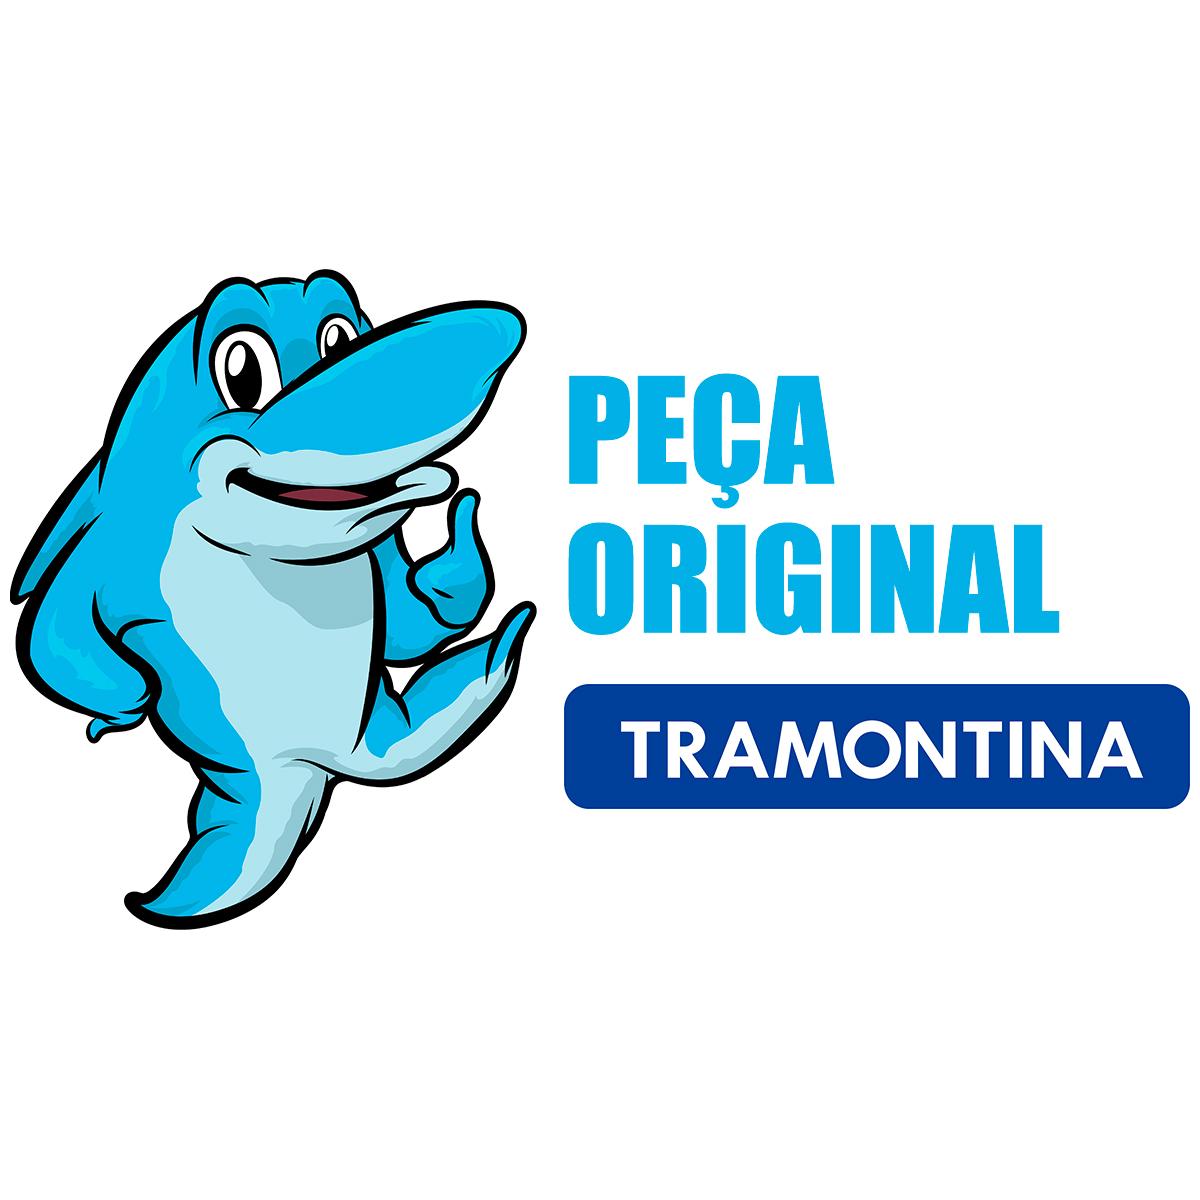 Kit Gaxeta para Lavadora Tramontina 1500psi 1200w, 1600psi 1400w e 1900psi 1800w Original 3 Peças